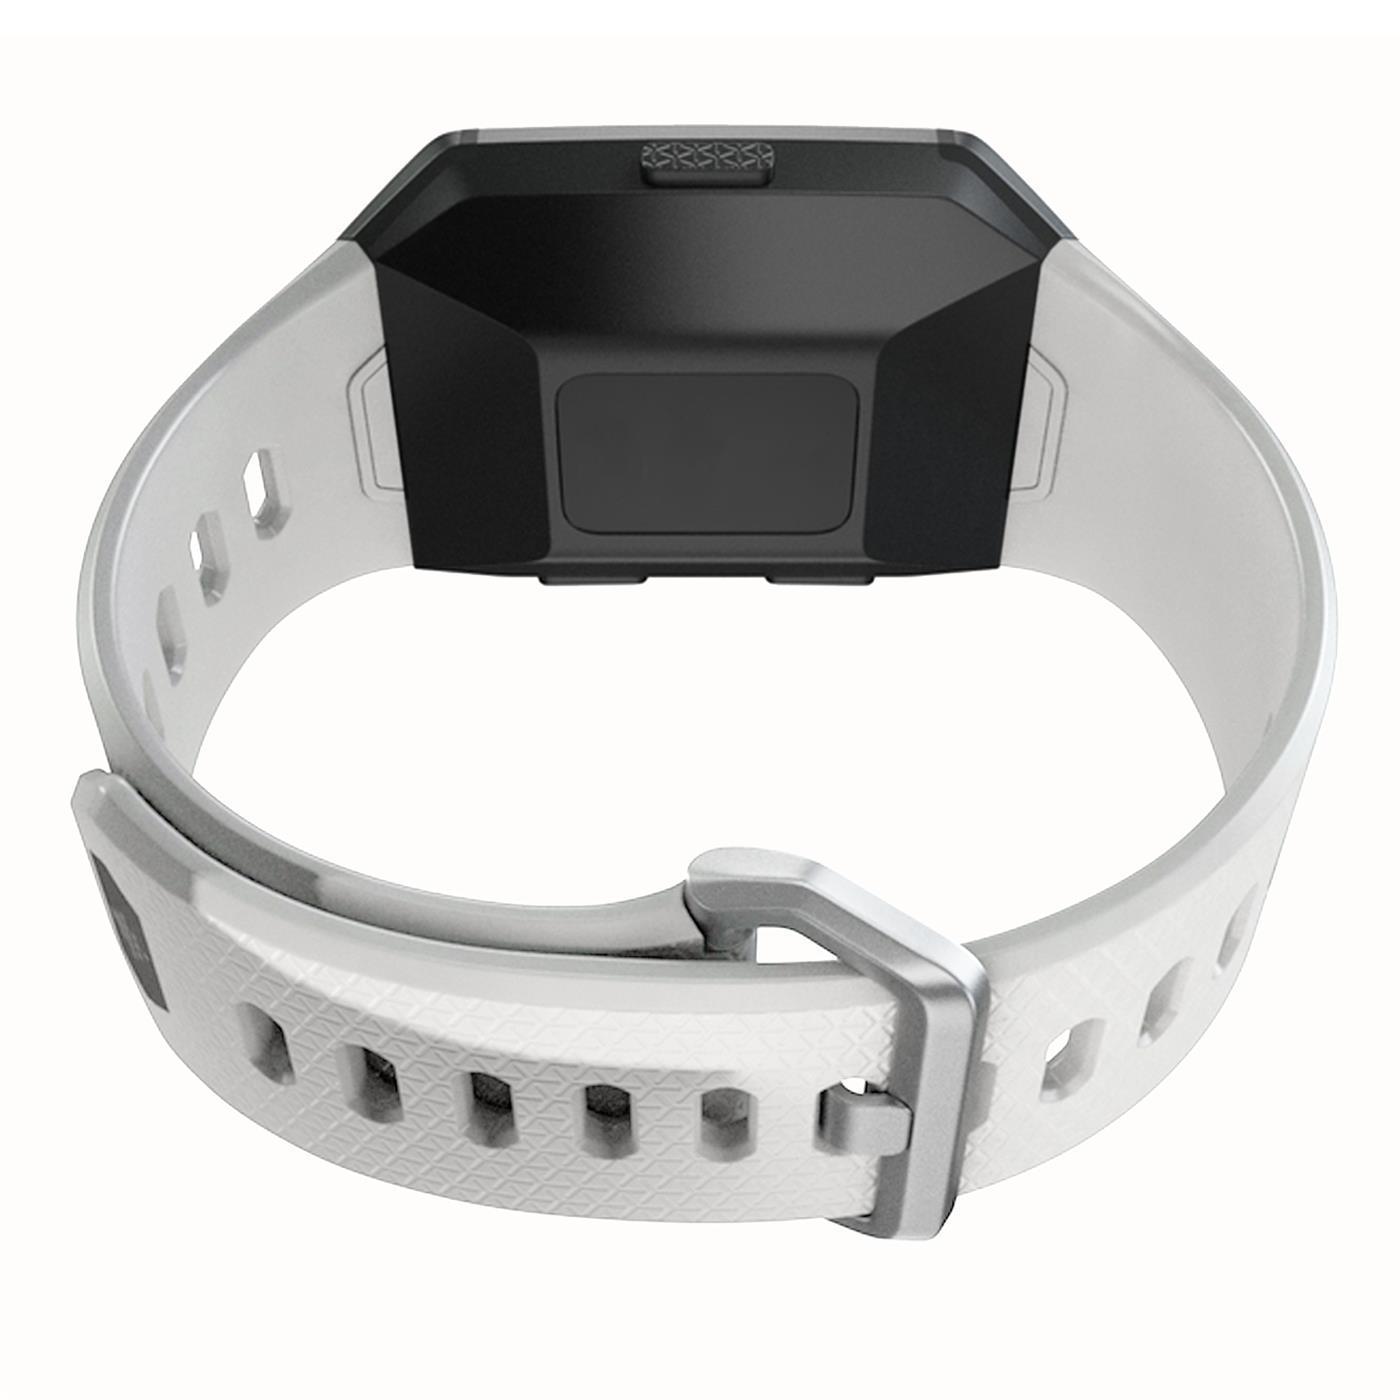 Fitbit-Groesse-S-oder-L-Ersatz-Silikon-Armband-Uhren-Sport-Band-Fitness-Tracker Indexbild 32